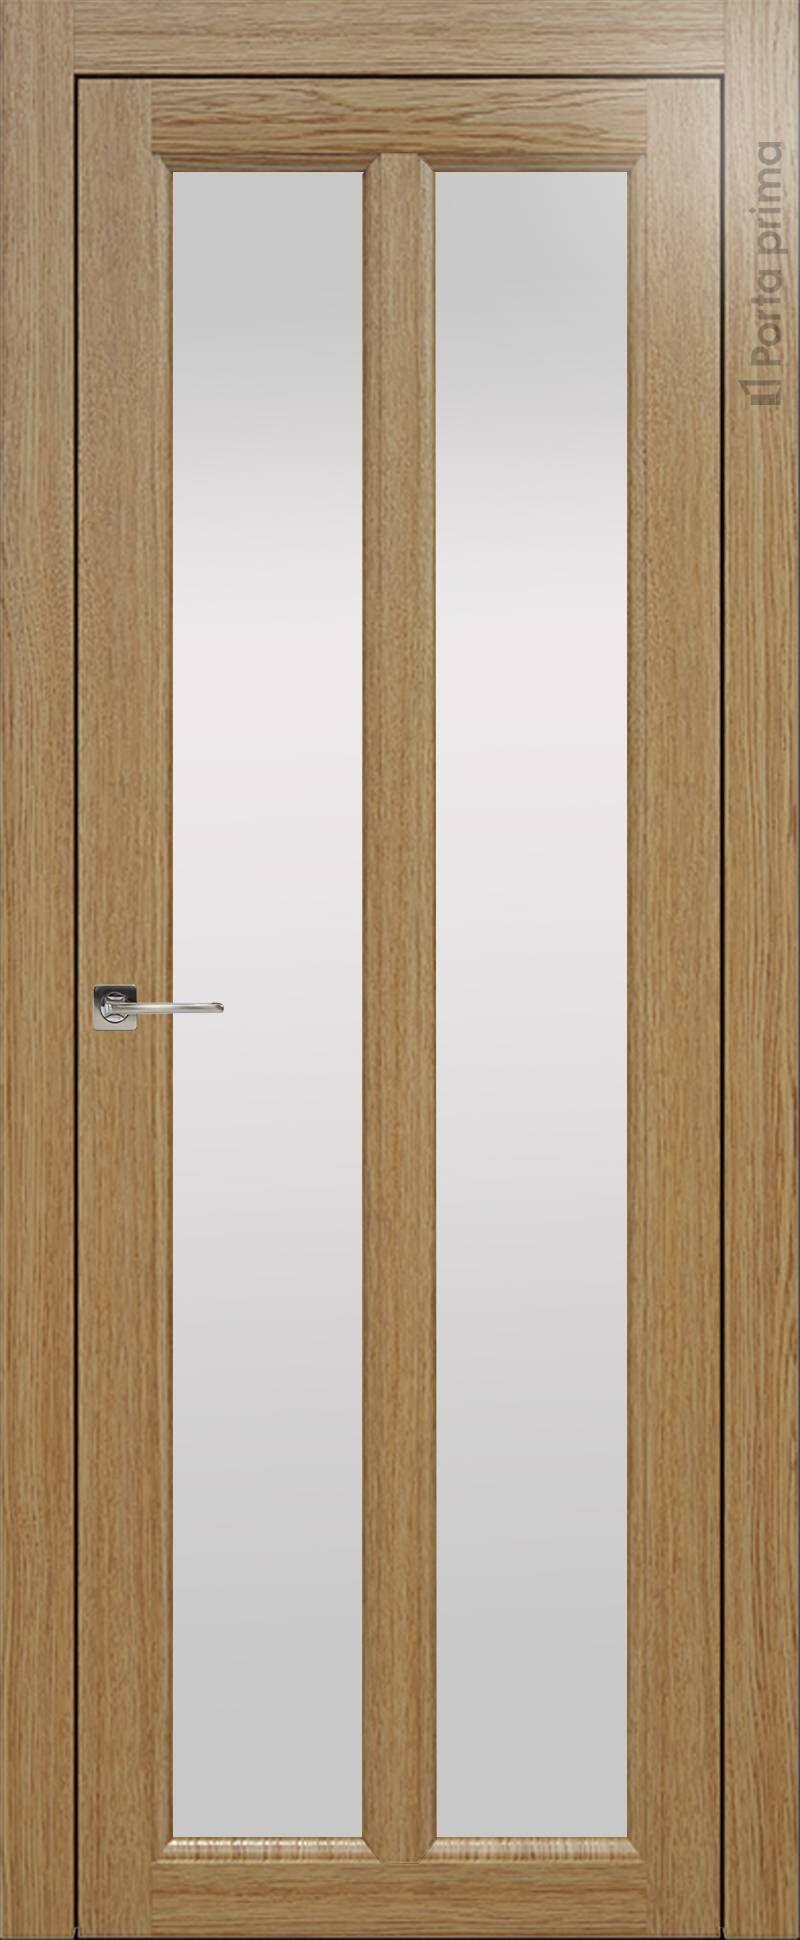 Sorrento-R Д4 цвет - Дуб карамель Со стеклом (ДО)